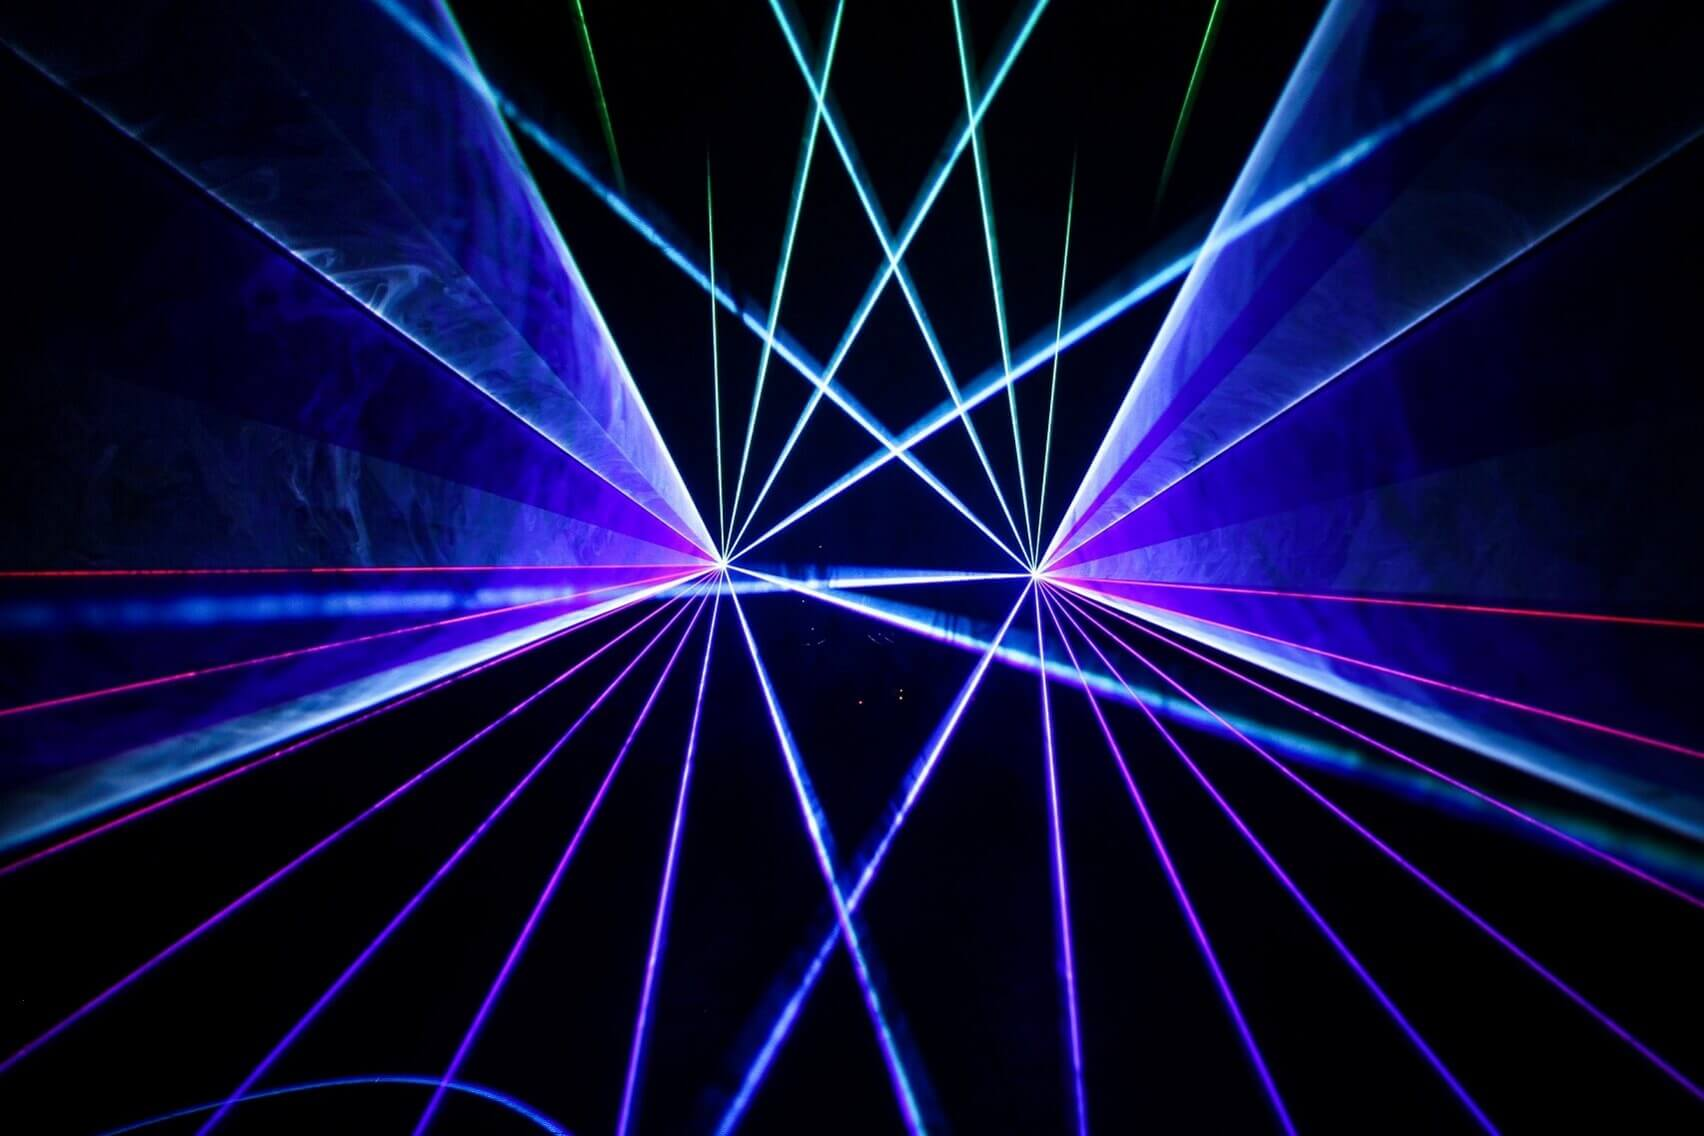 laser light show - photo #31